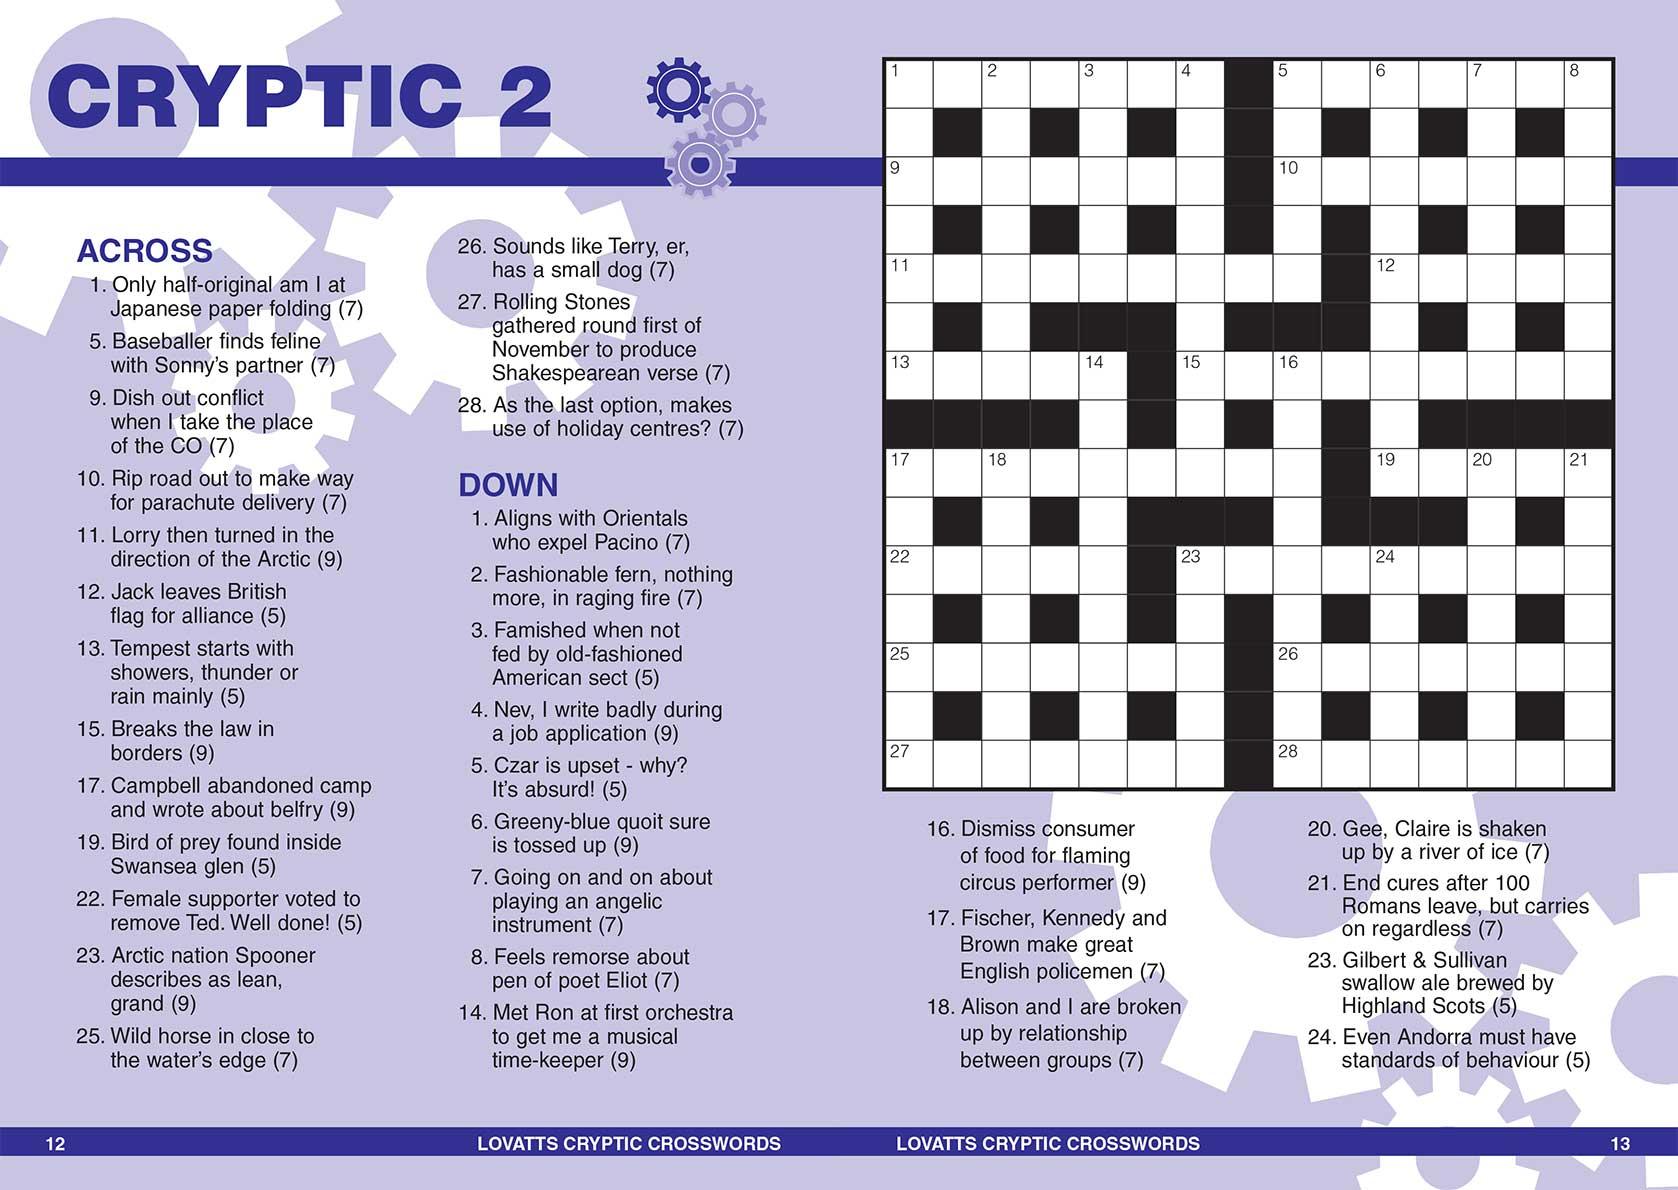 Handy Cryptic Crosswords Magazine - Lovatts Crosswords & Puzzles - Printable Cryptic Crossword Puzzles Nz